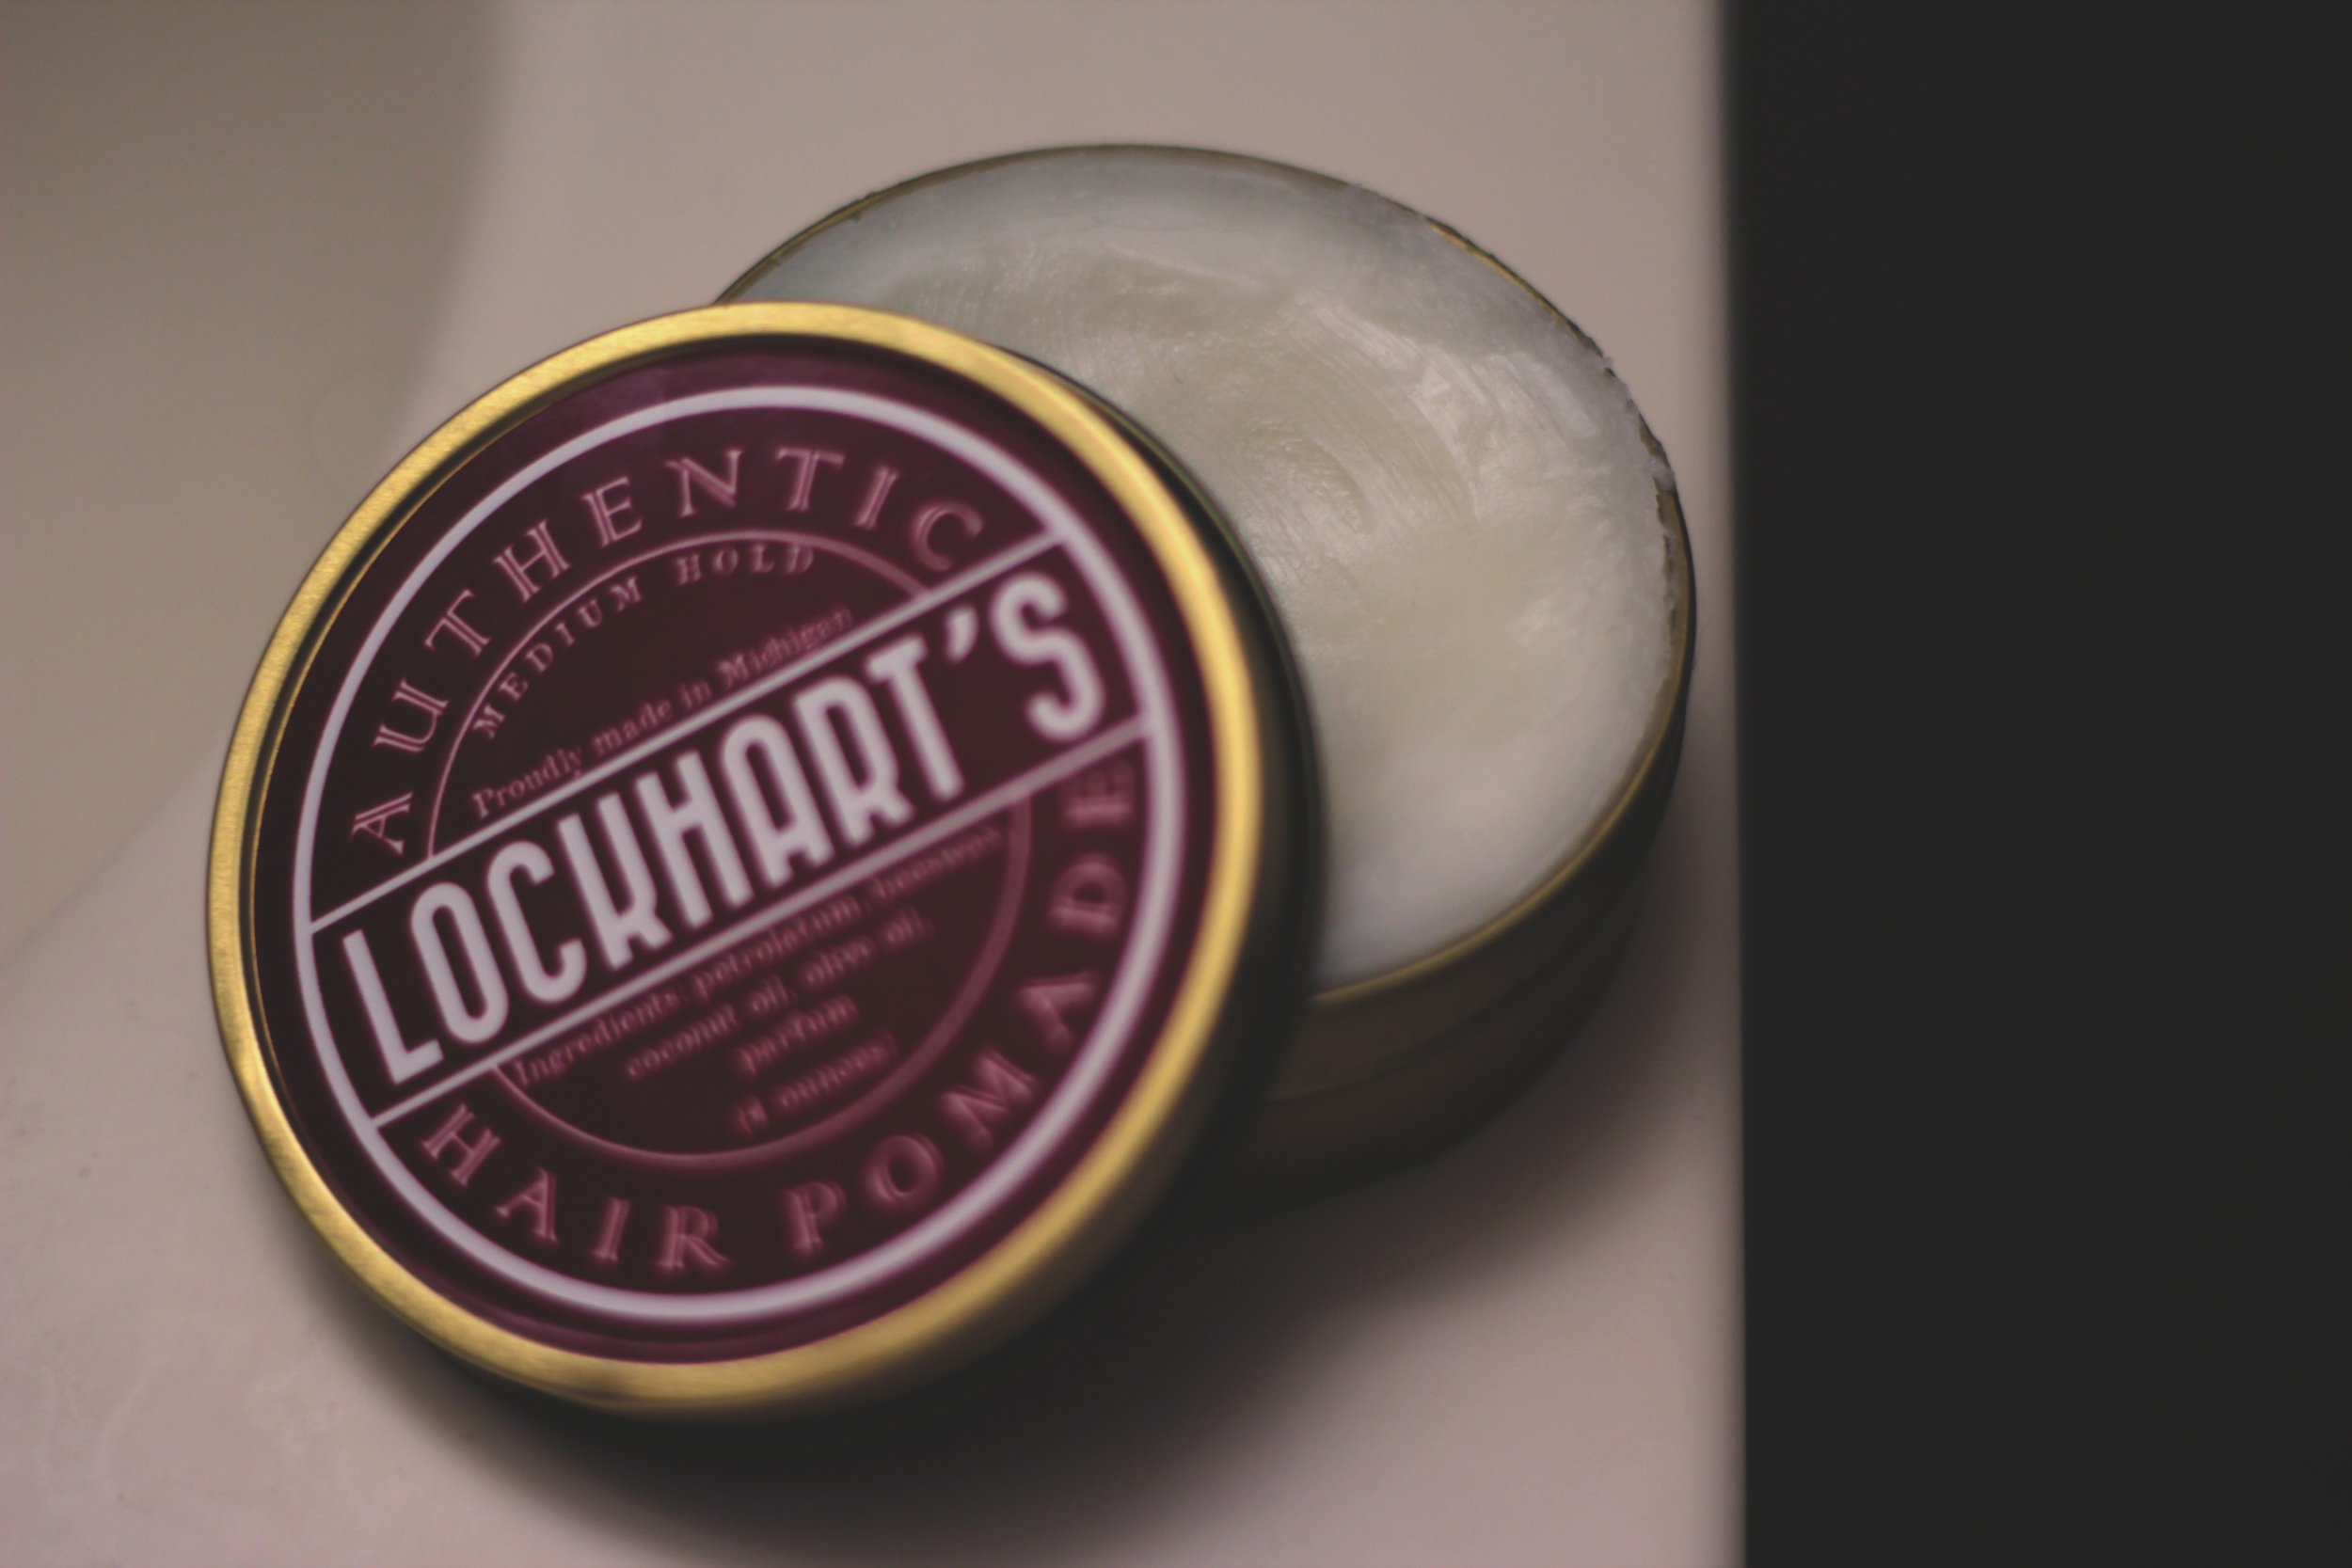 Lockhart's Authentic Hair Pomade Medium Hold - texture